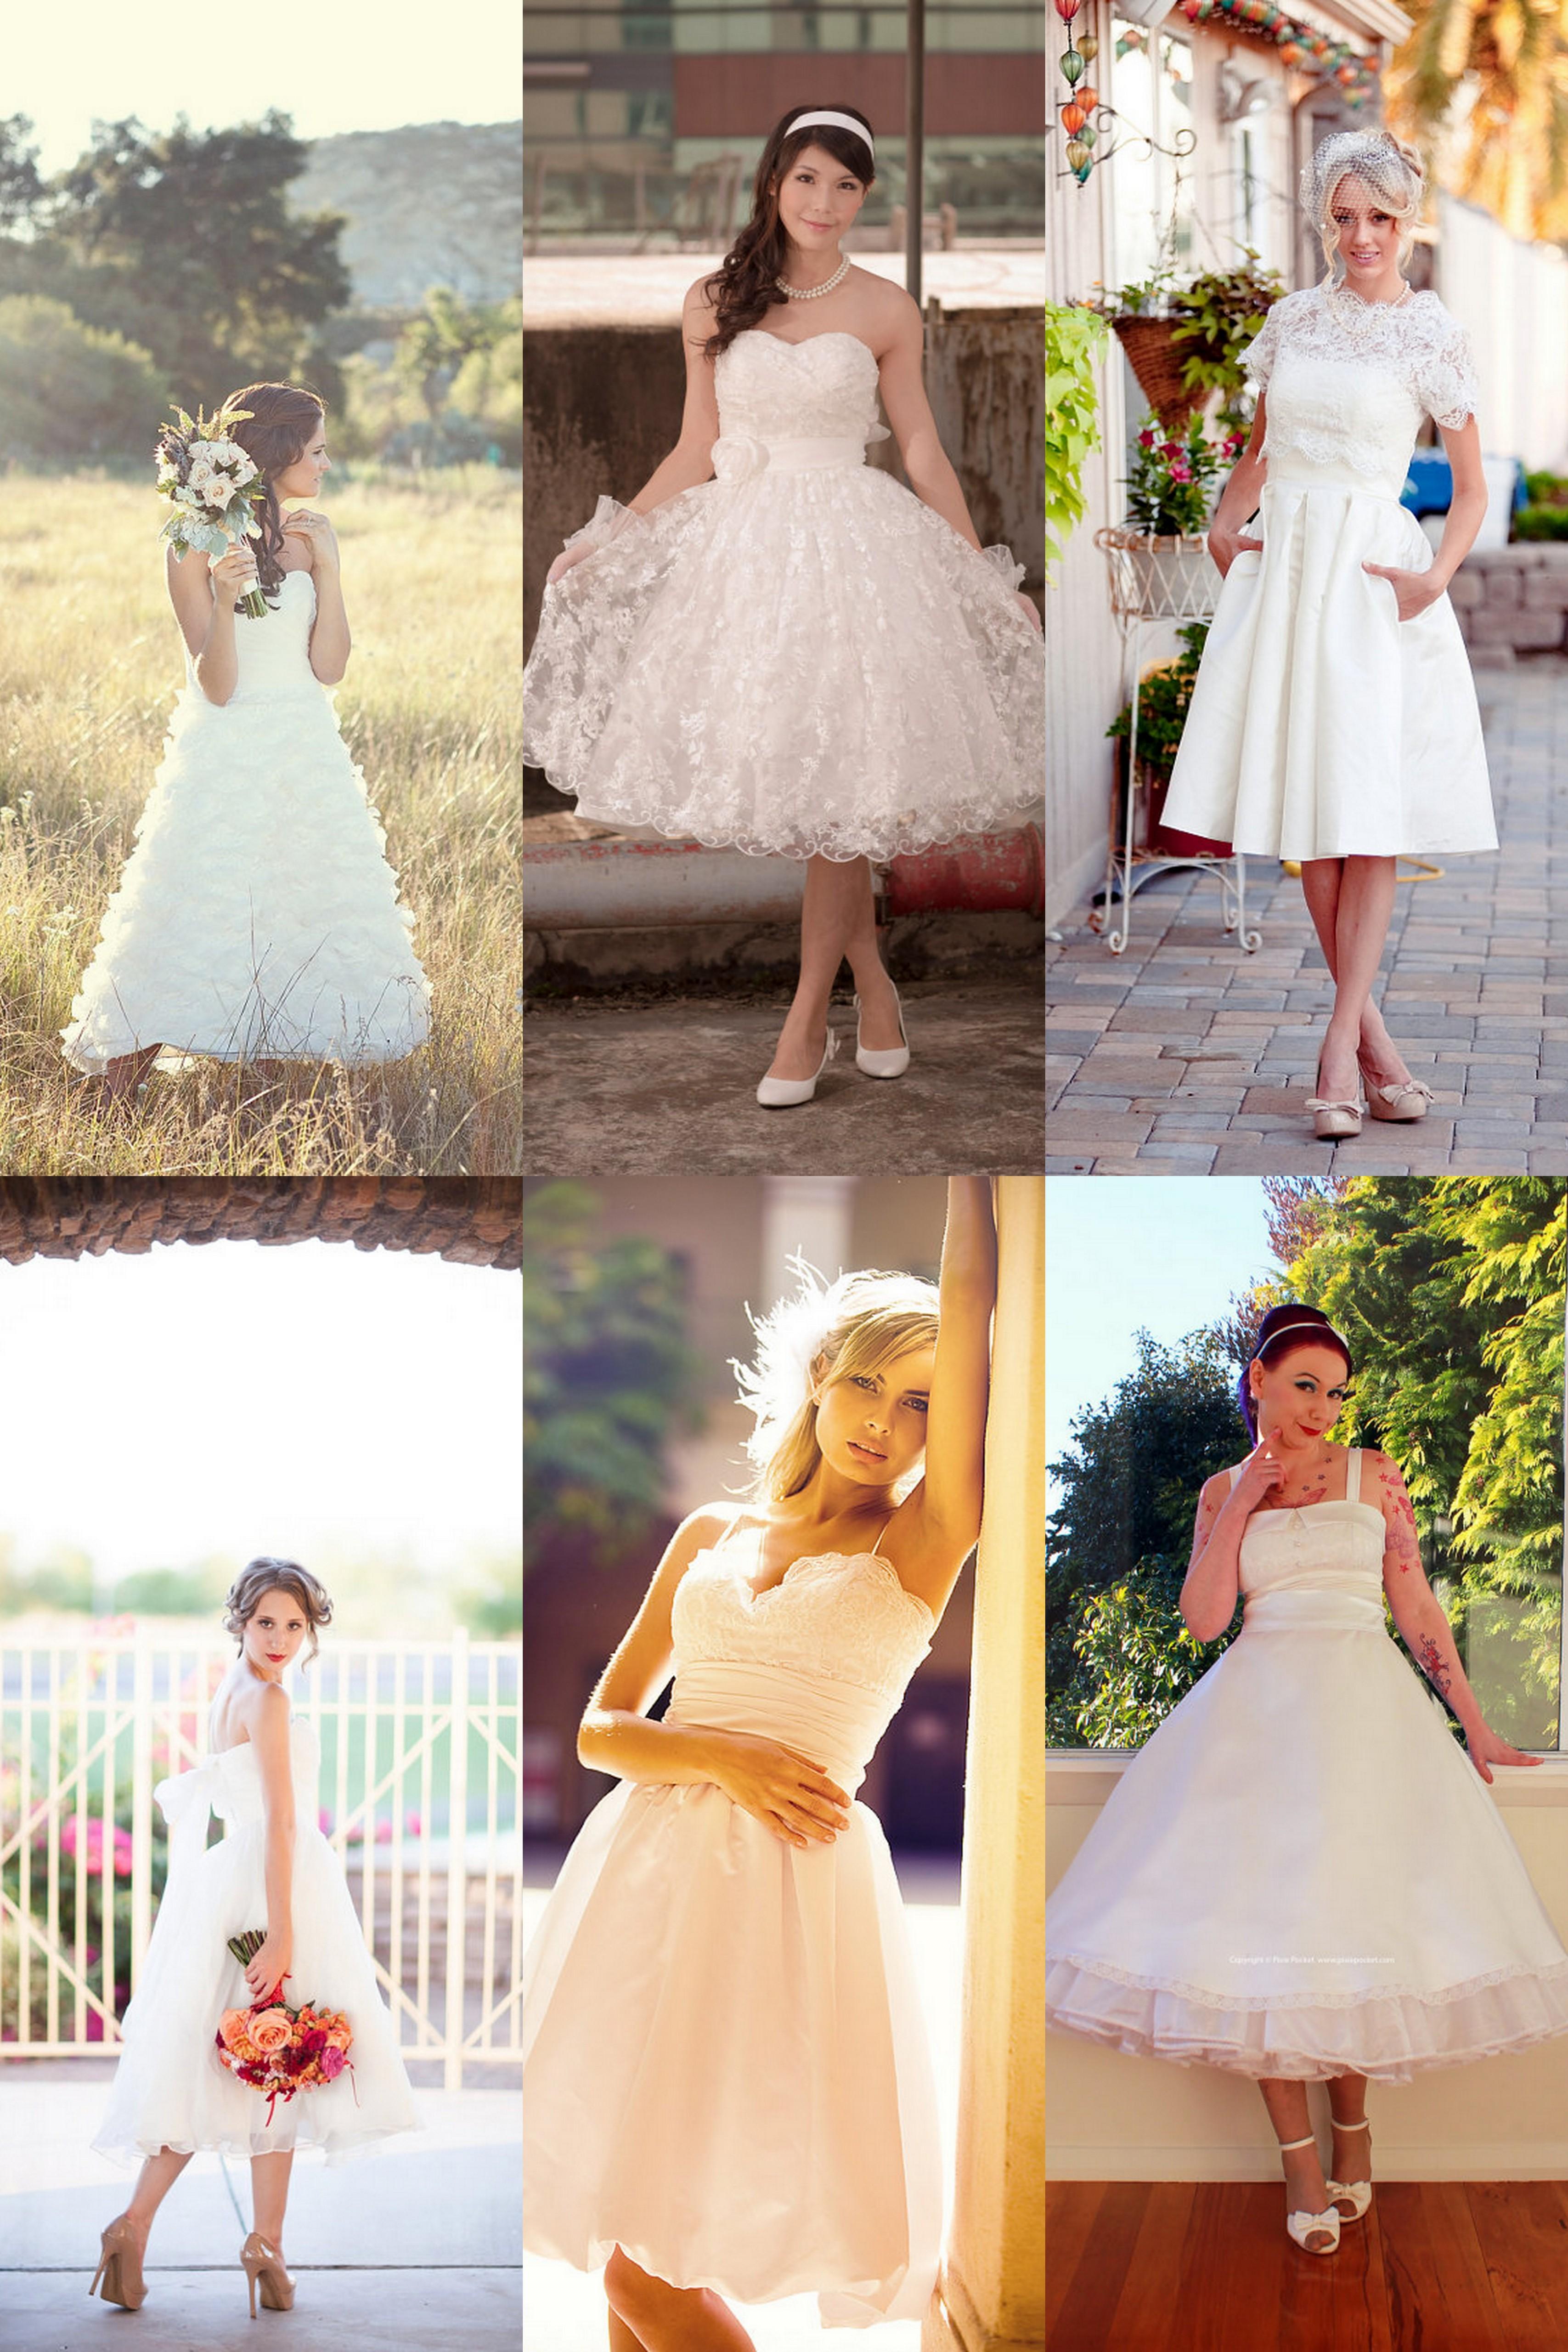 Tea Length Wedding Dresses Weddingdates Co Uk Blog,Wedding Party Wear New Dresses For Girls